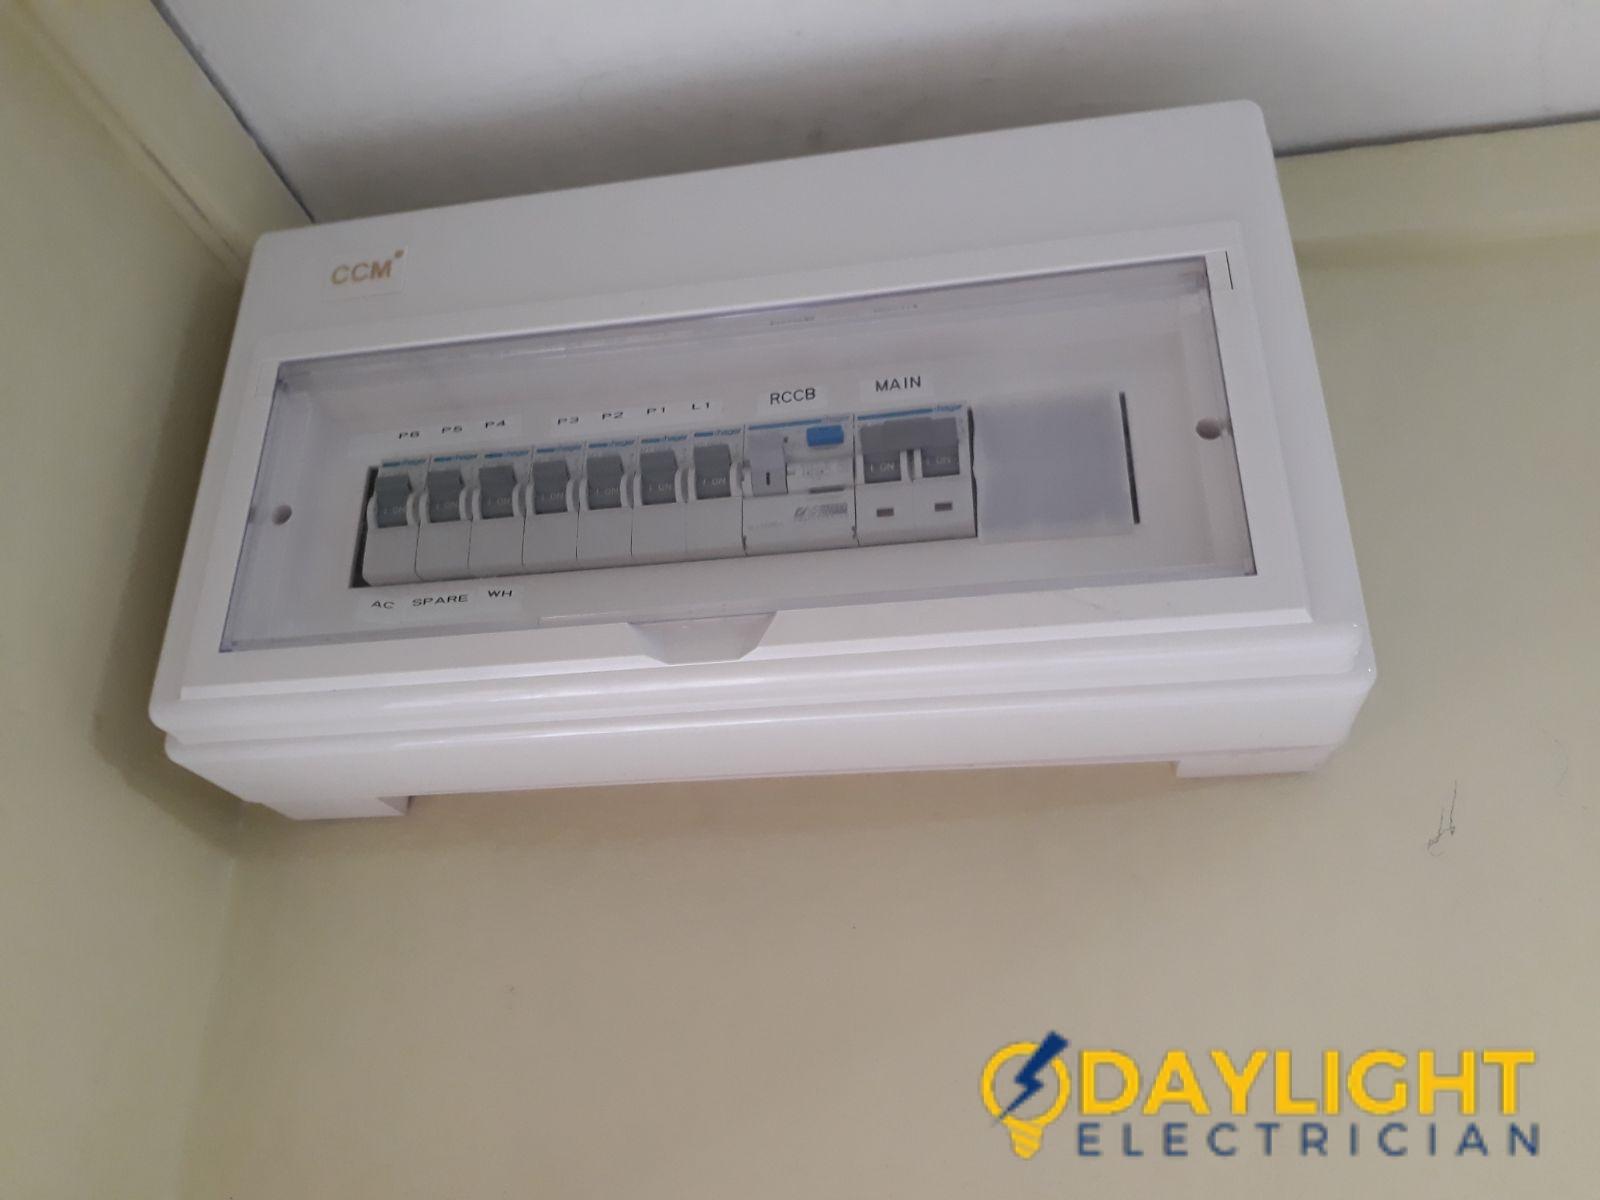 Db-Box-Distribution-Board-Replacement-Electrician-Singapore-HDB-Buona-Vista-3_wm